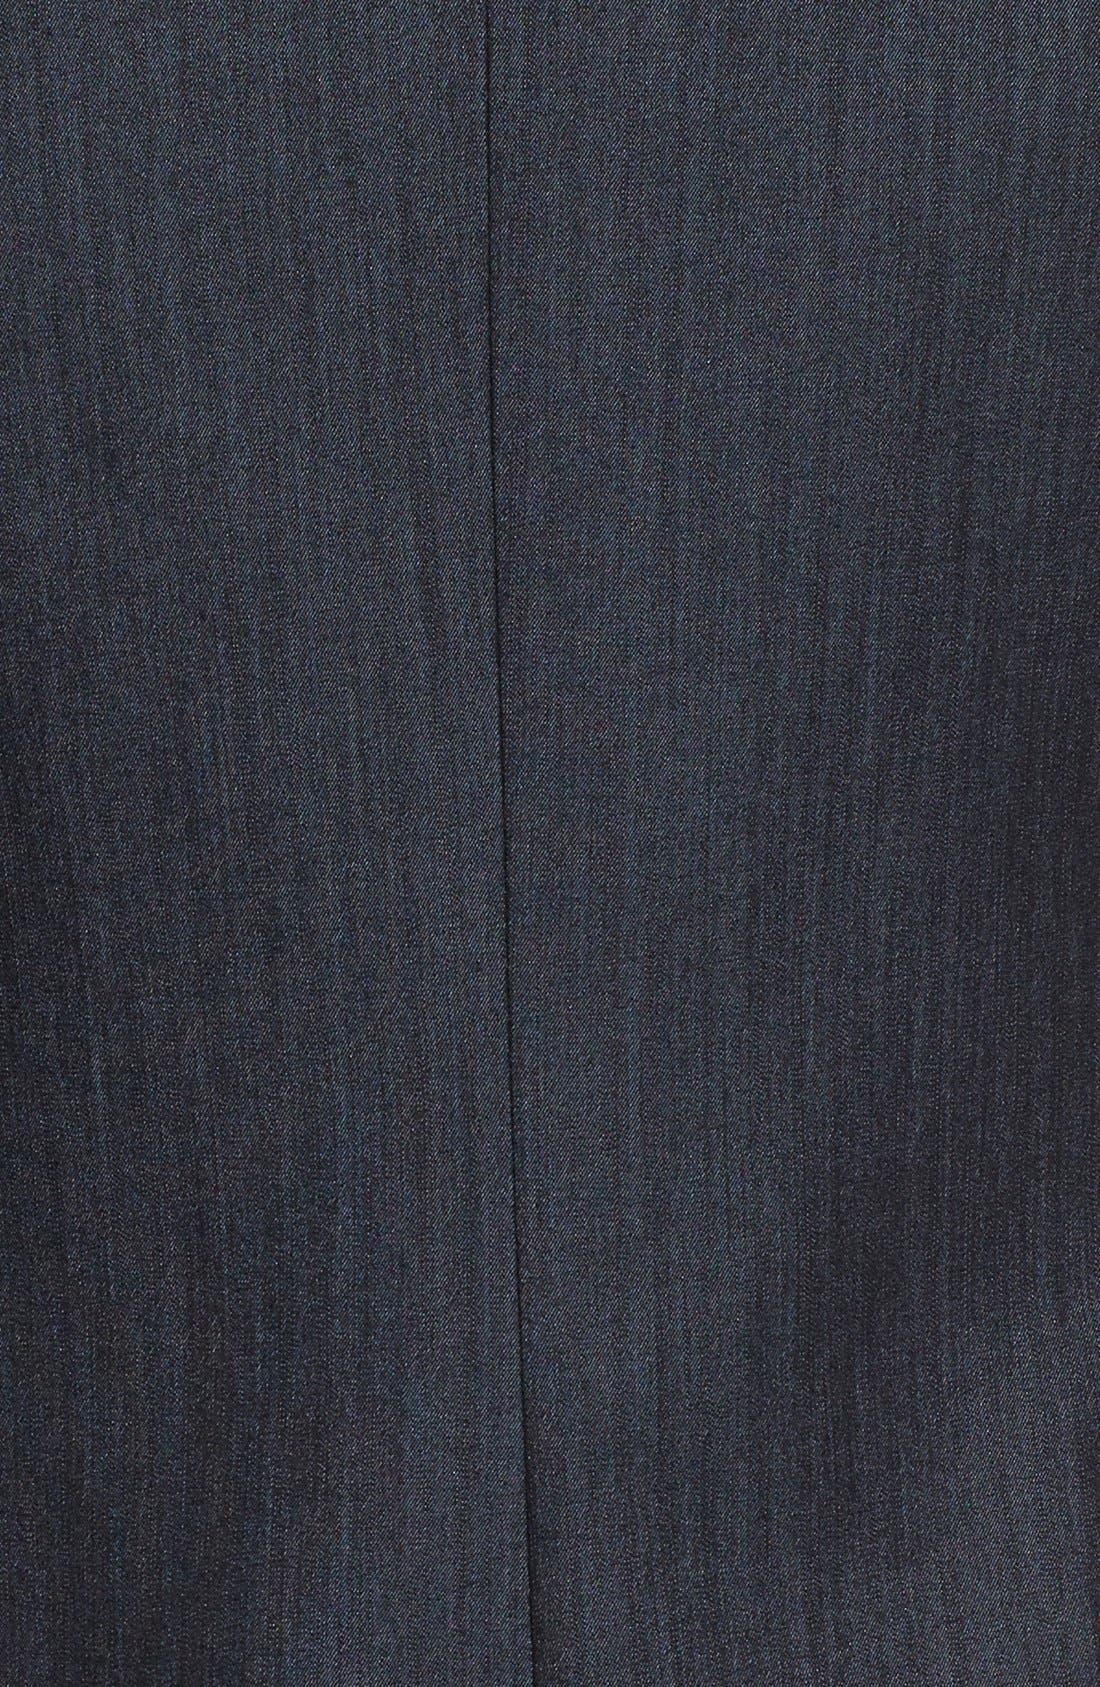 Twill One-Button Jacket,                             Alternate thumbnail 6, color,                             Indigo Twill